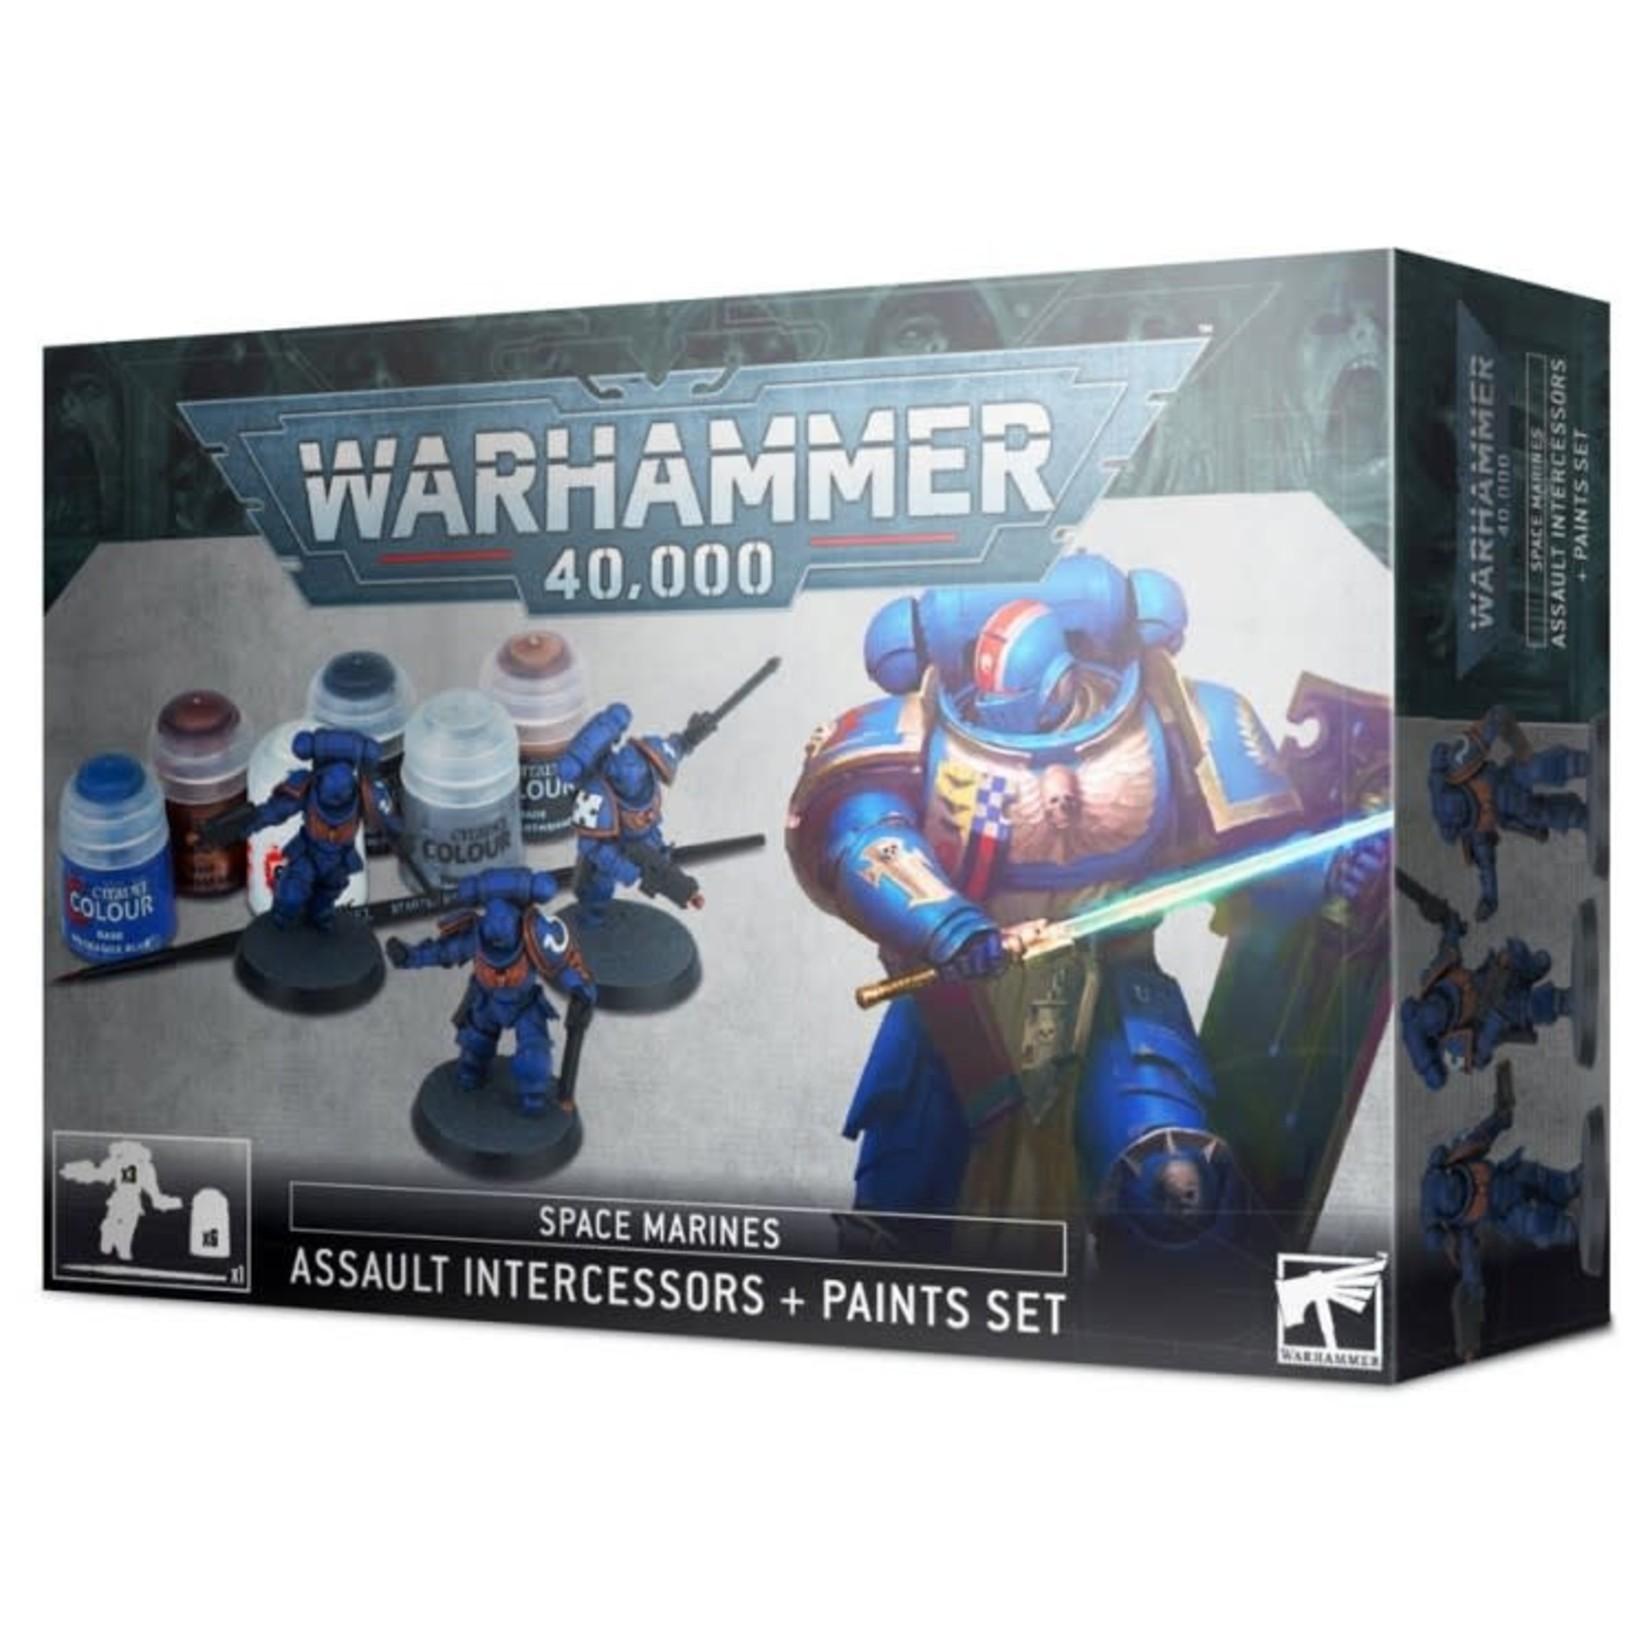 Games Workshop Warhammer 40k: Space Marines - Assault Intercessor and Paint Set